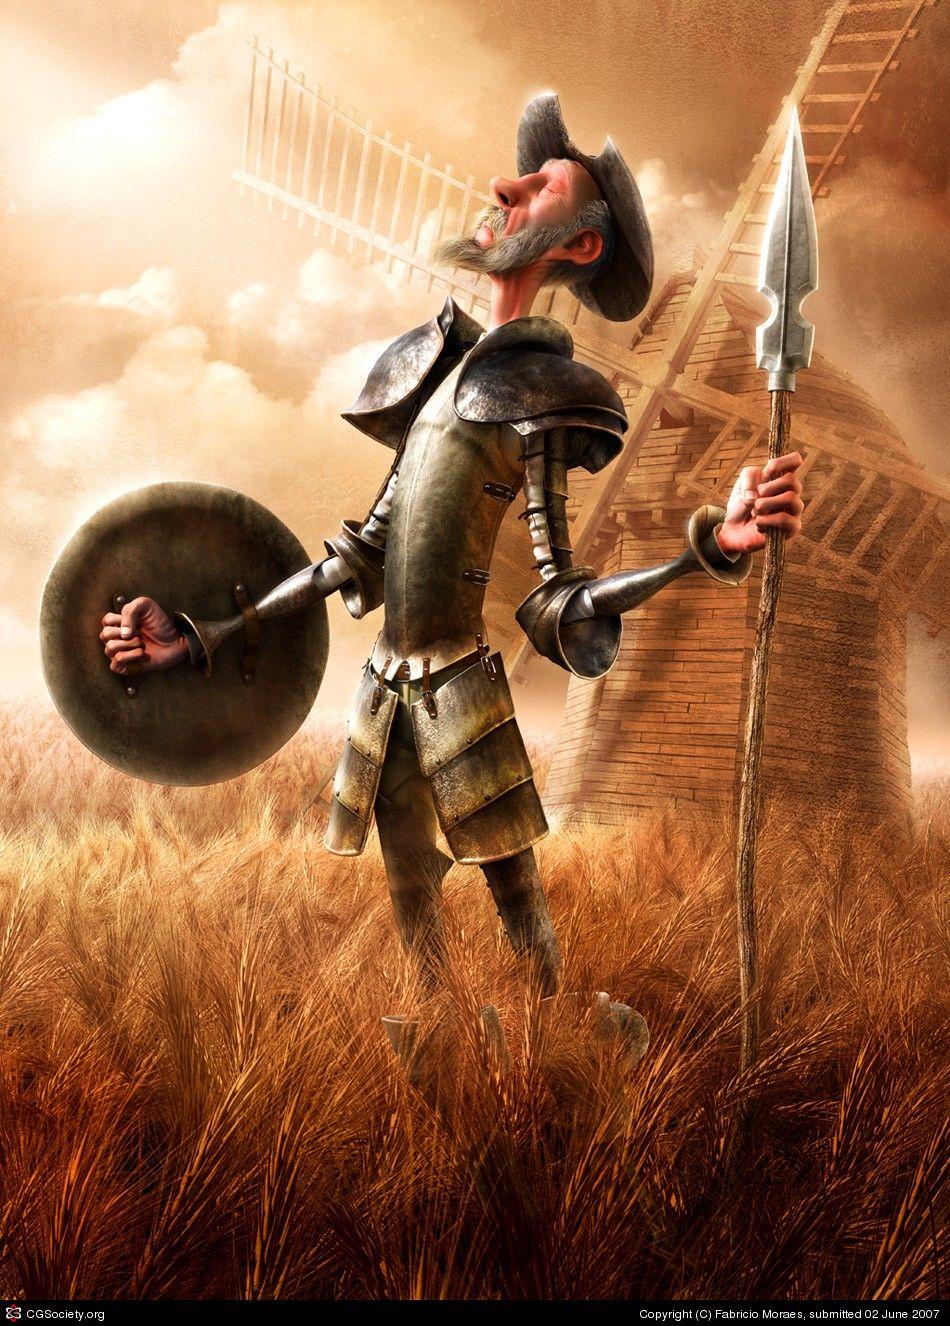 Don Quixote de la Mancha, Fabricio Moraes (3D)